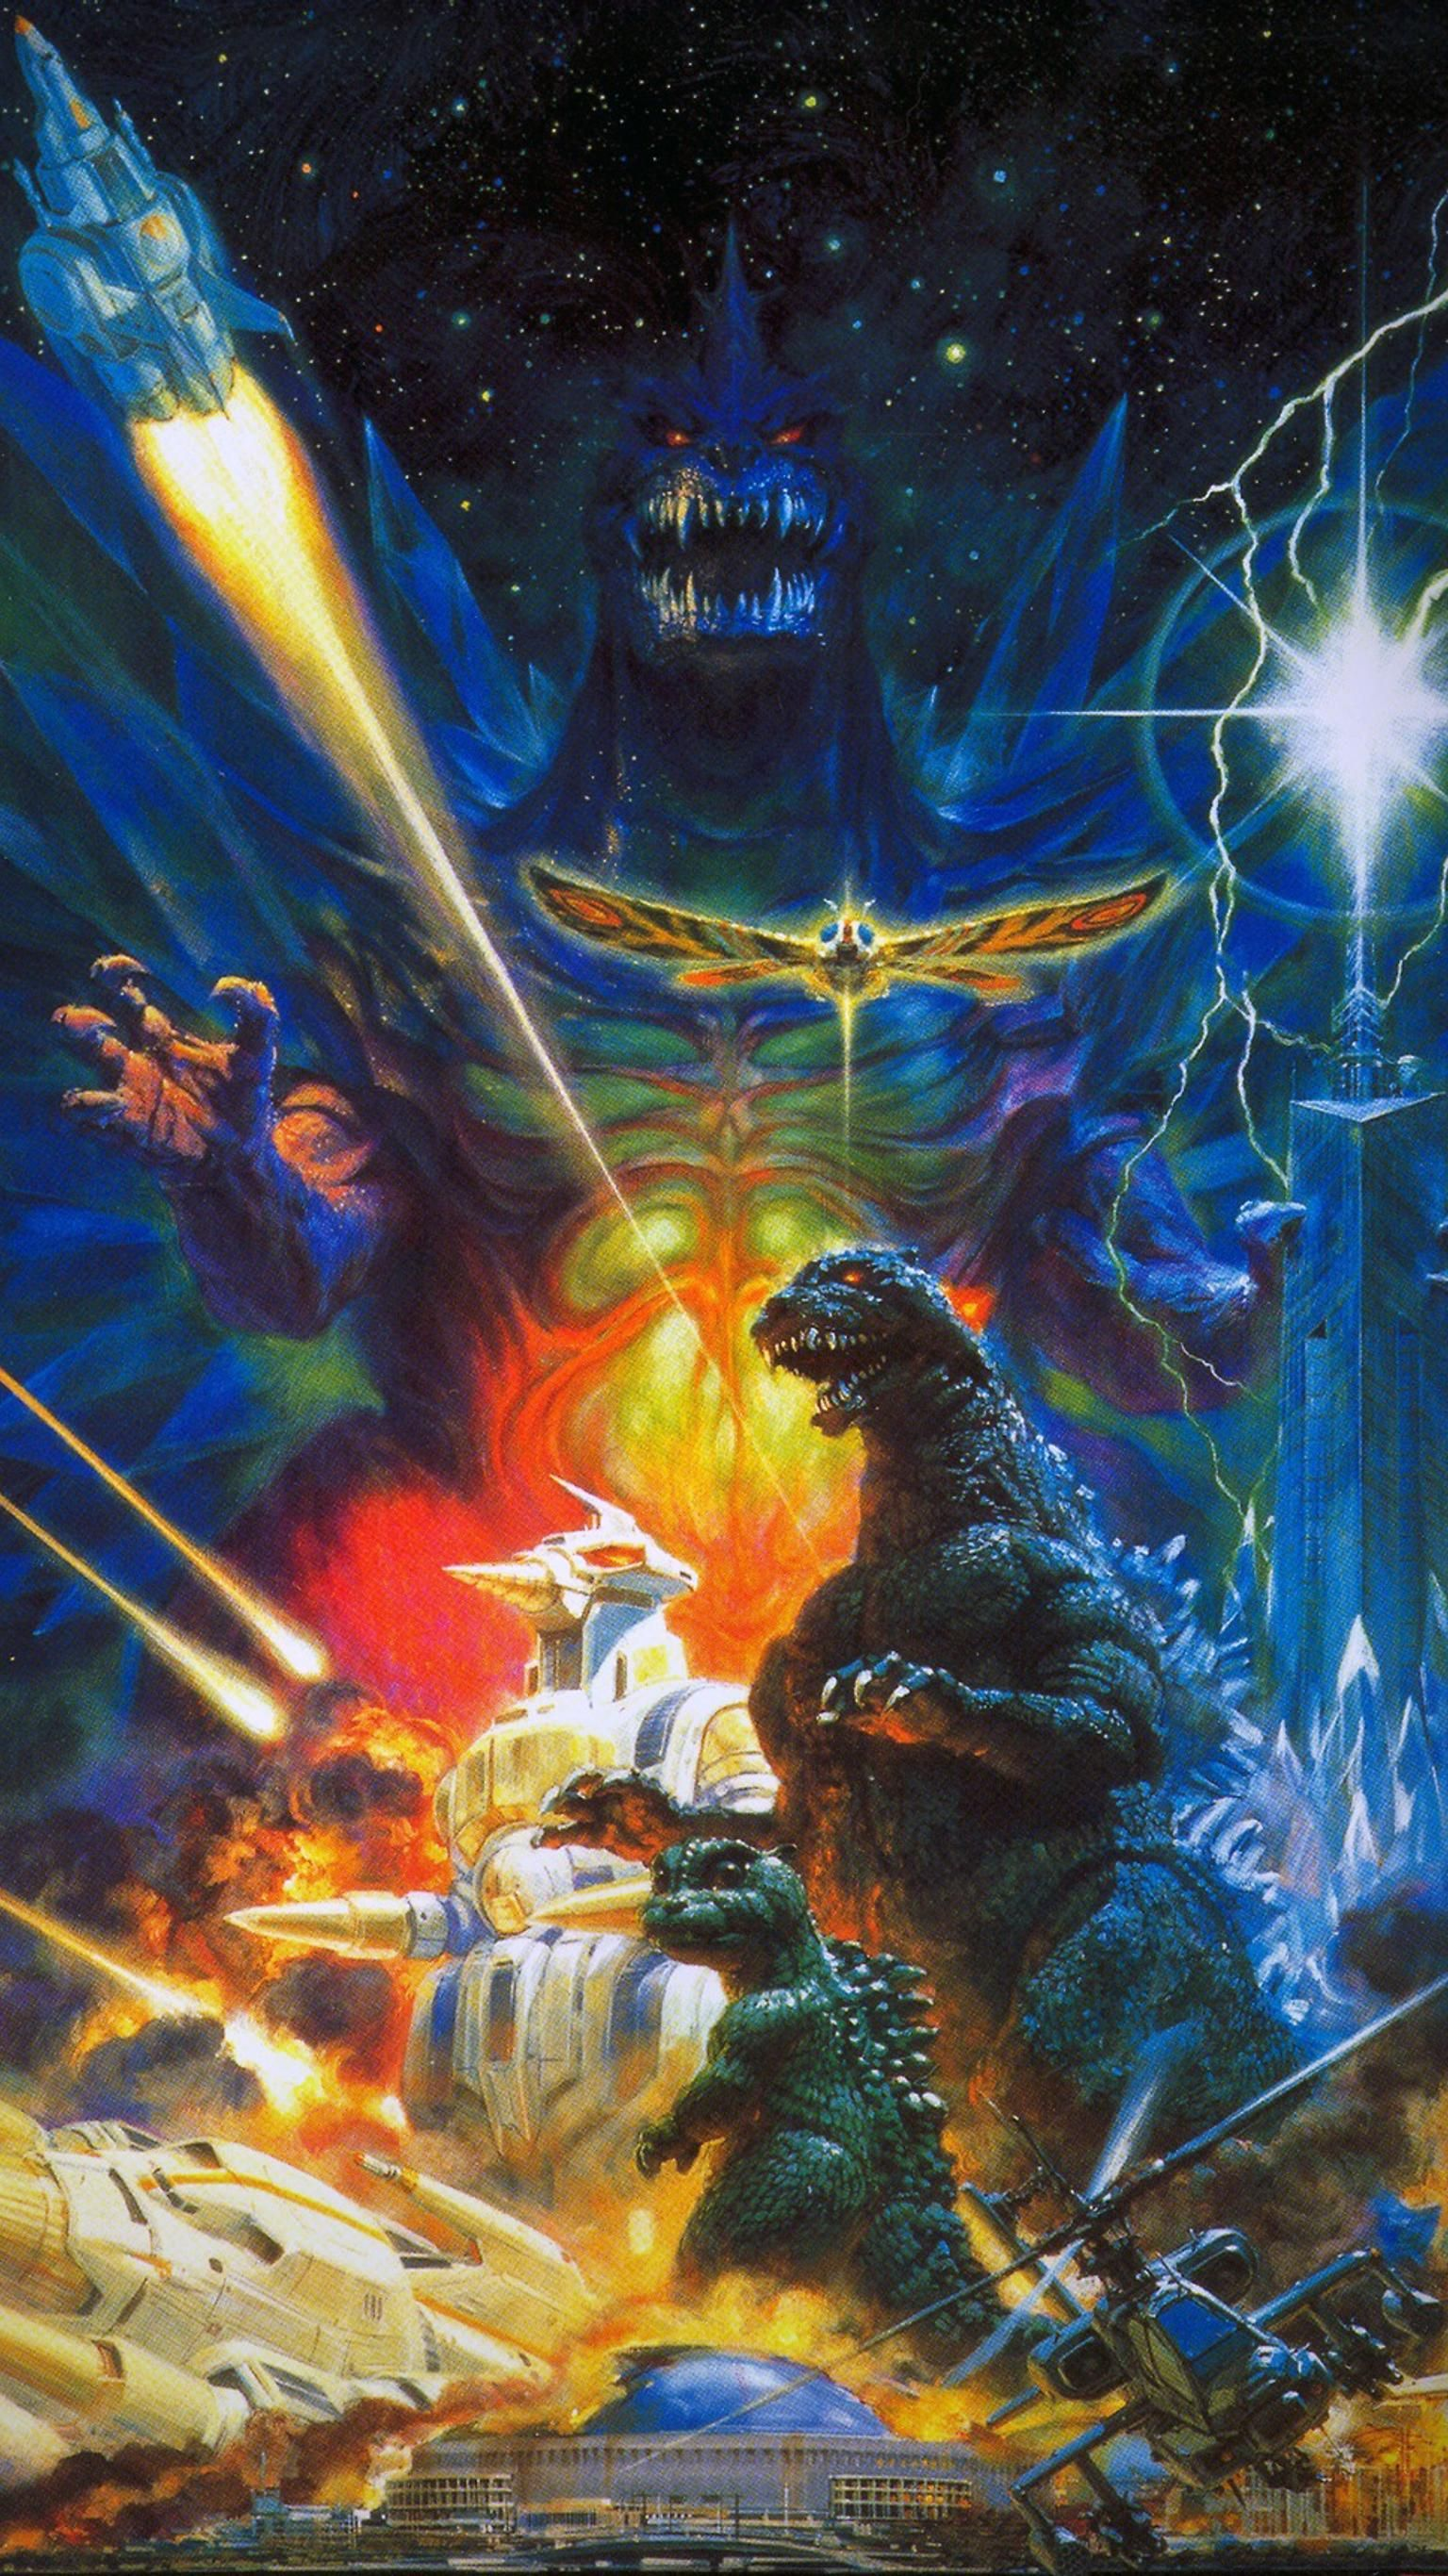 Godzilla vs. SpaceGodzilla (1994) Phone Wallpaper | Godzilla | Original godzilla, Godzilla vs ...